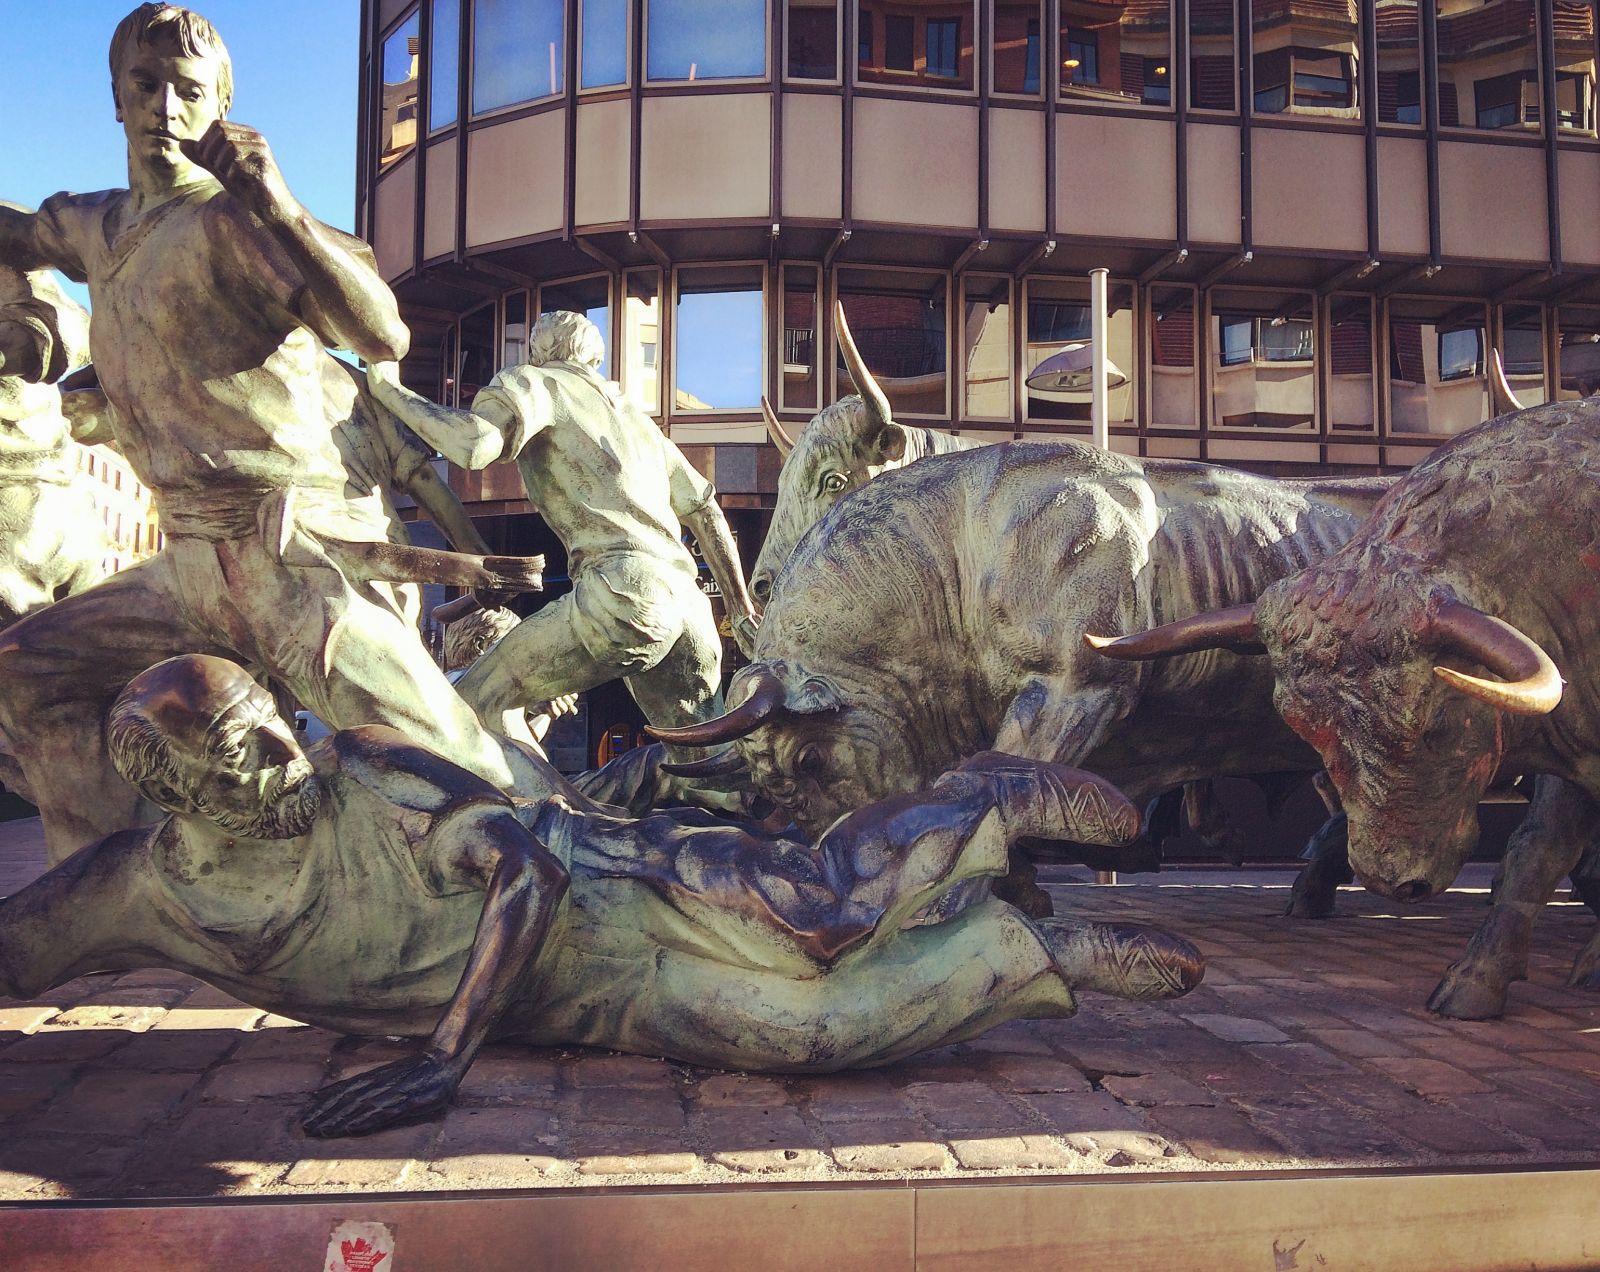 pamplona-bulls-statue-spain-light